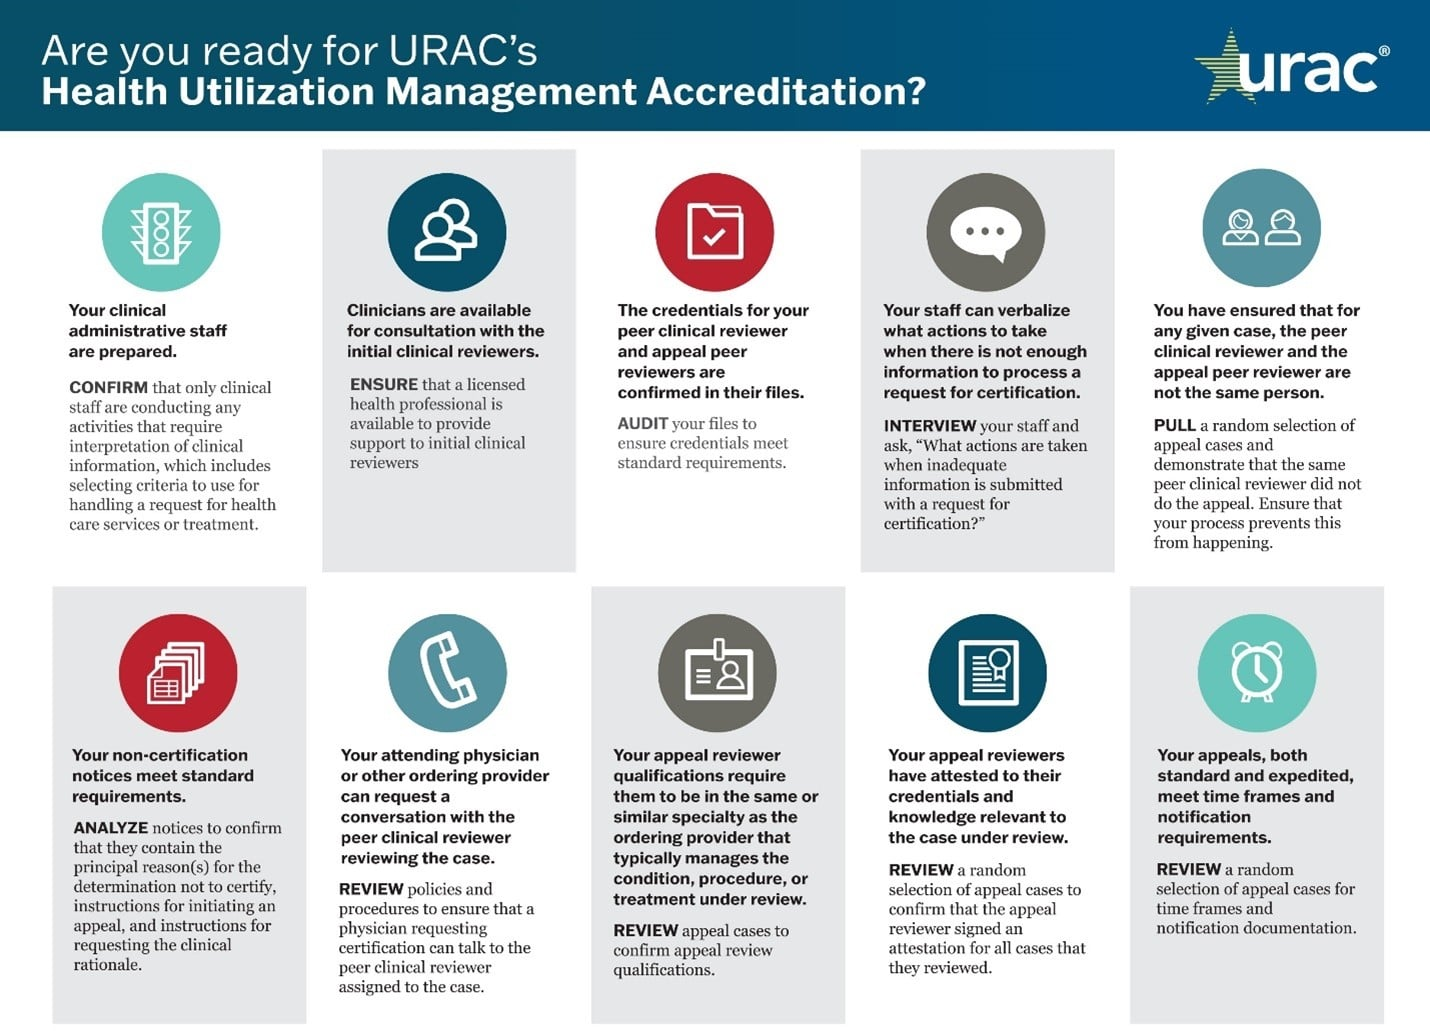 URAC health utilization management accreditation